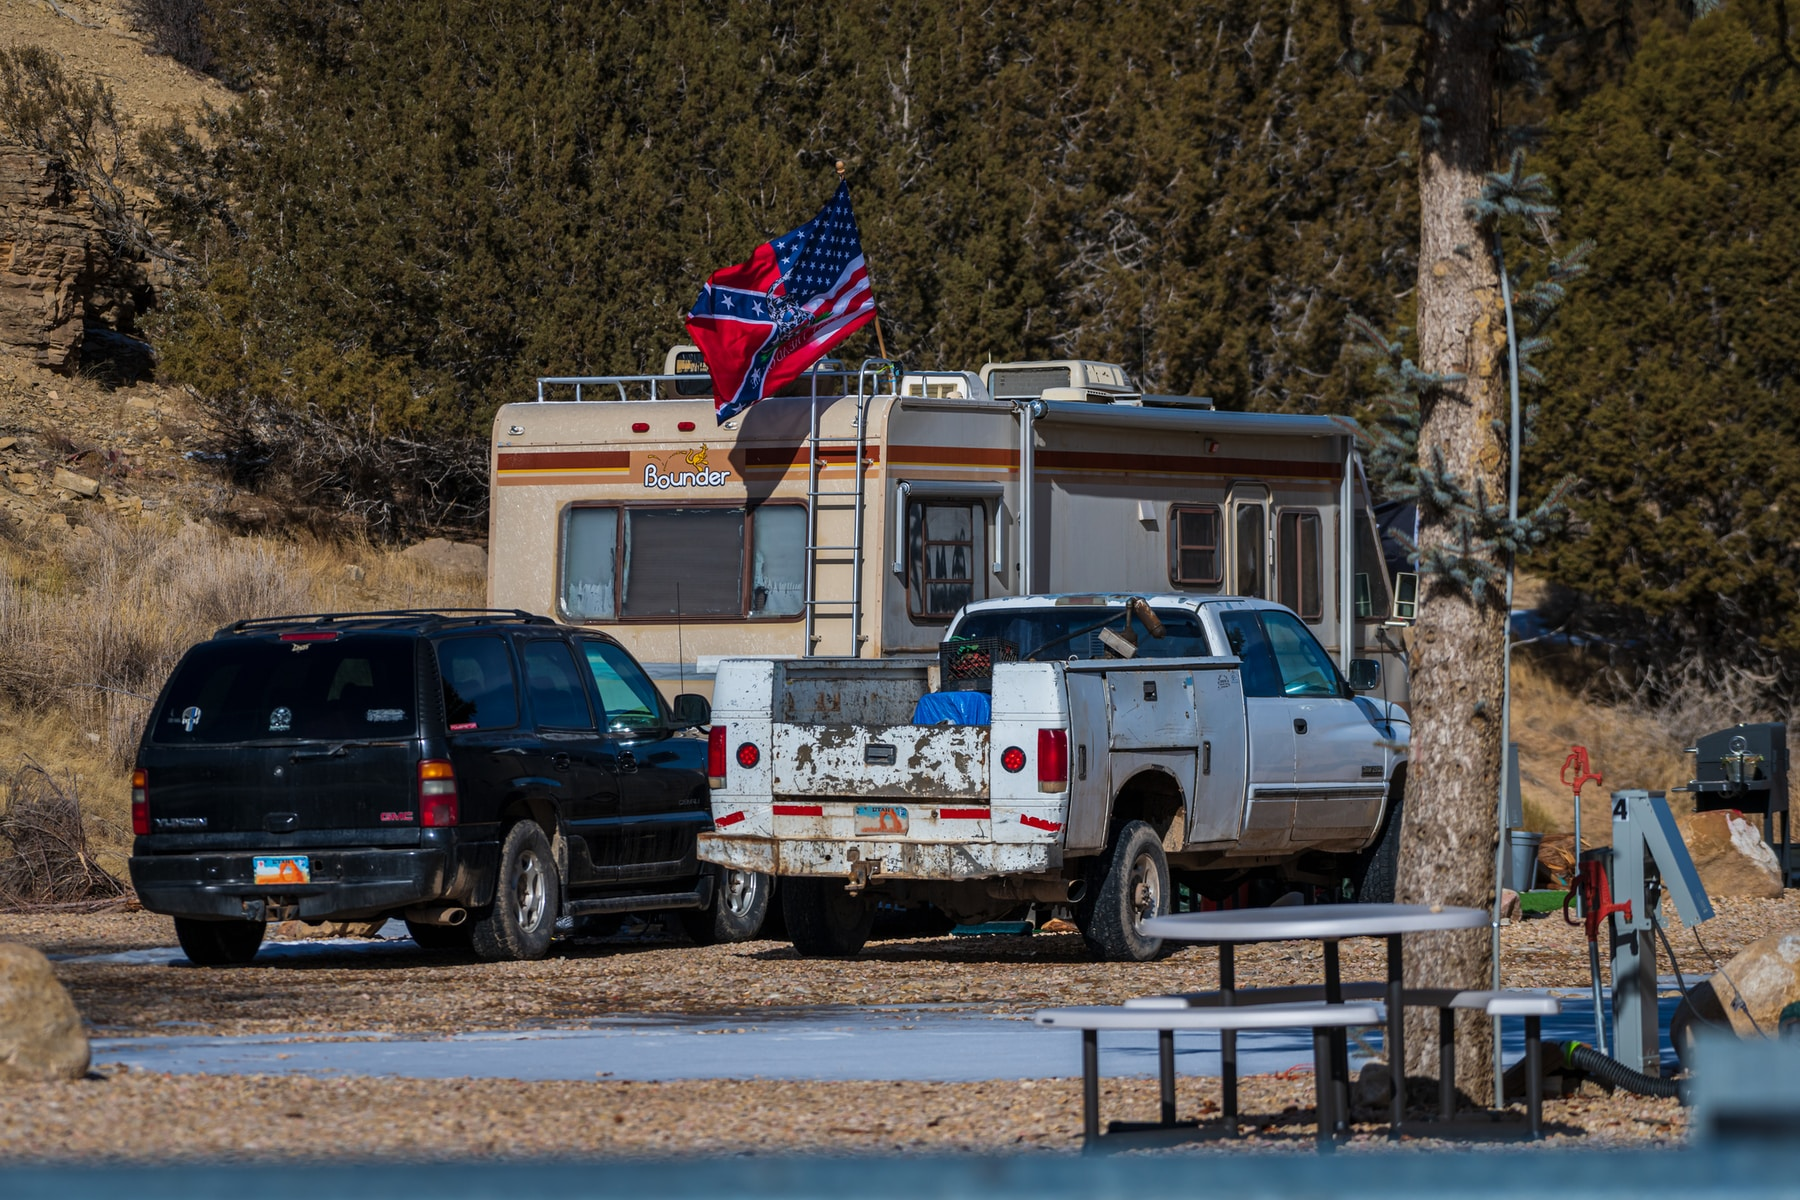 Mt Carmel, Utah, United States- 01312021: an RVer put a blended Gadsden USA Confederate Flag, Triple Threat Flag on his RV near Zion National Park.